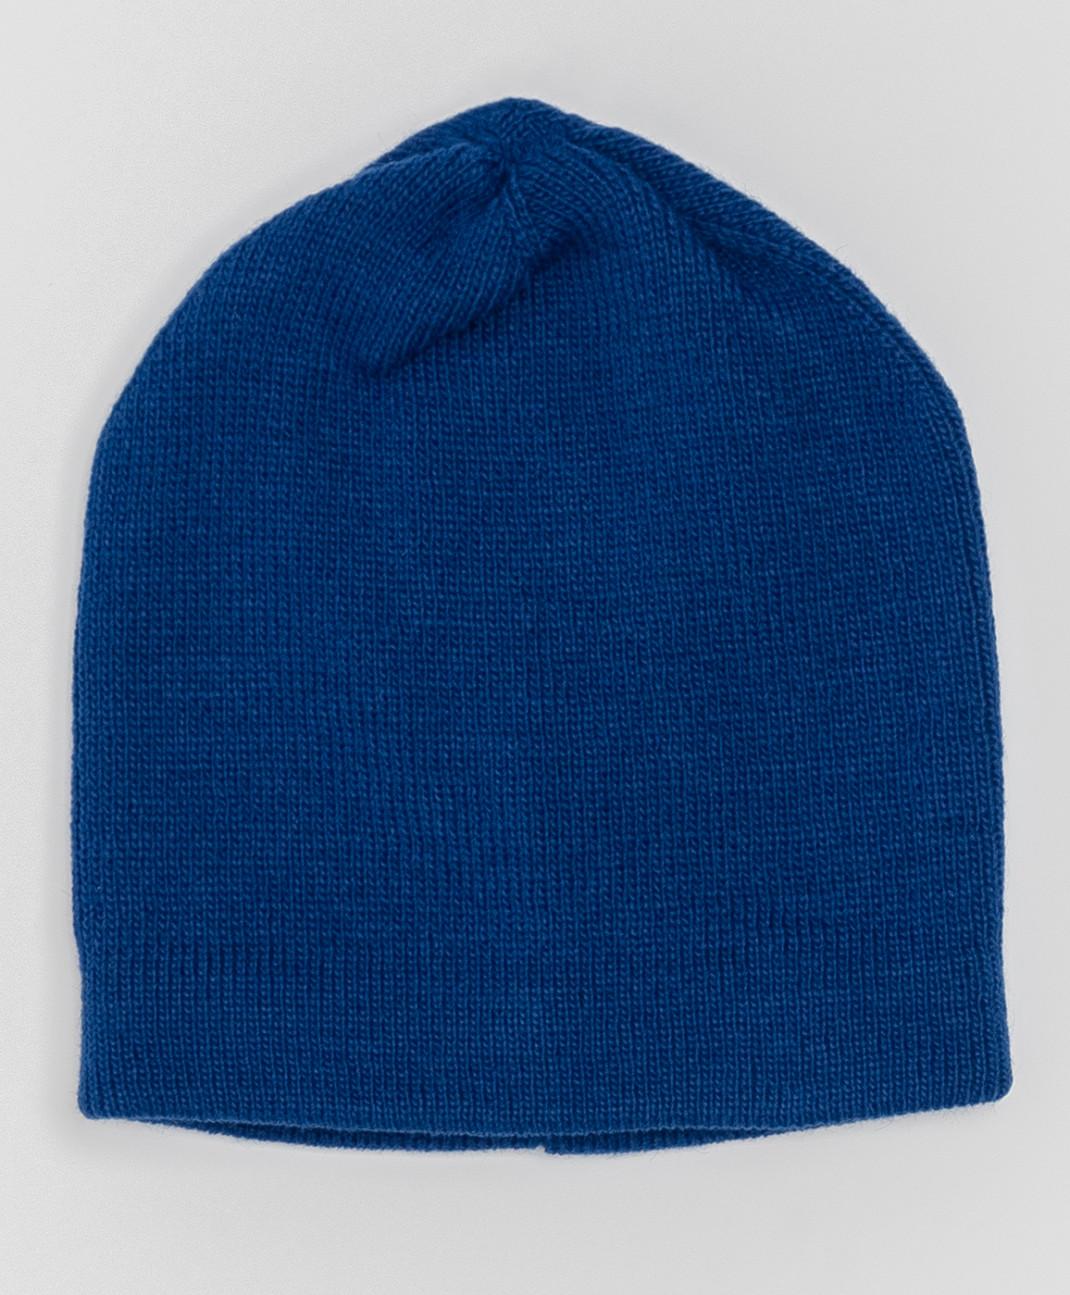 Button Blue Синяя шапка с завязками Button Blue